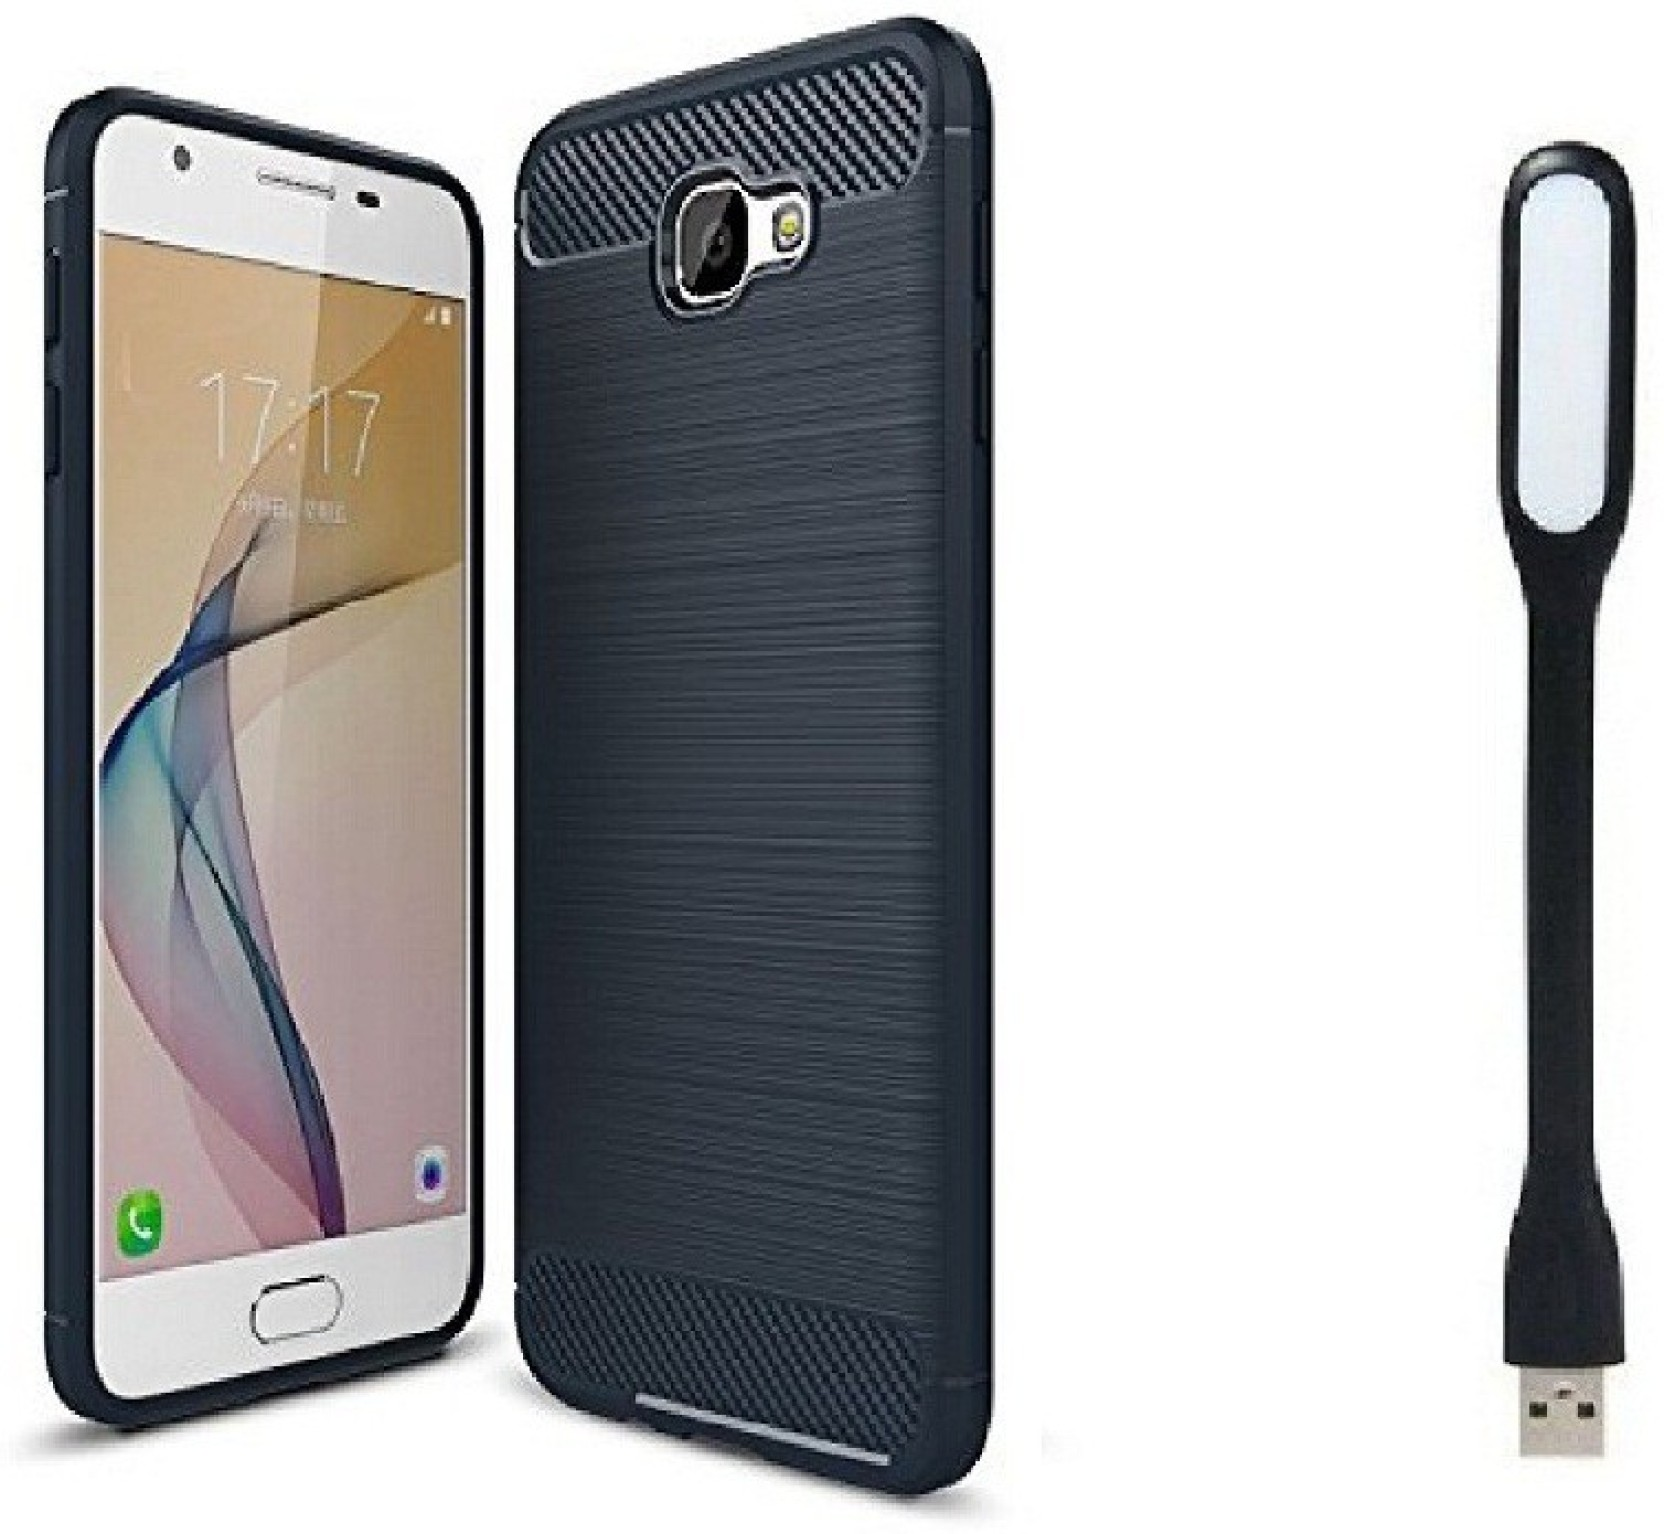 Luke Cover Accessory Combo For Samsung Galaxy J5 Prime G570 Price In Home